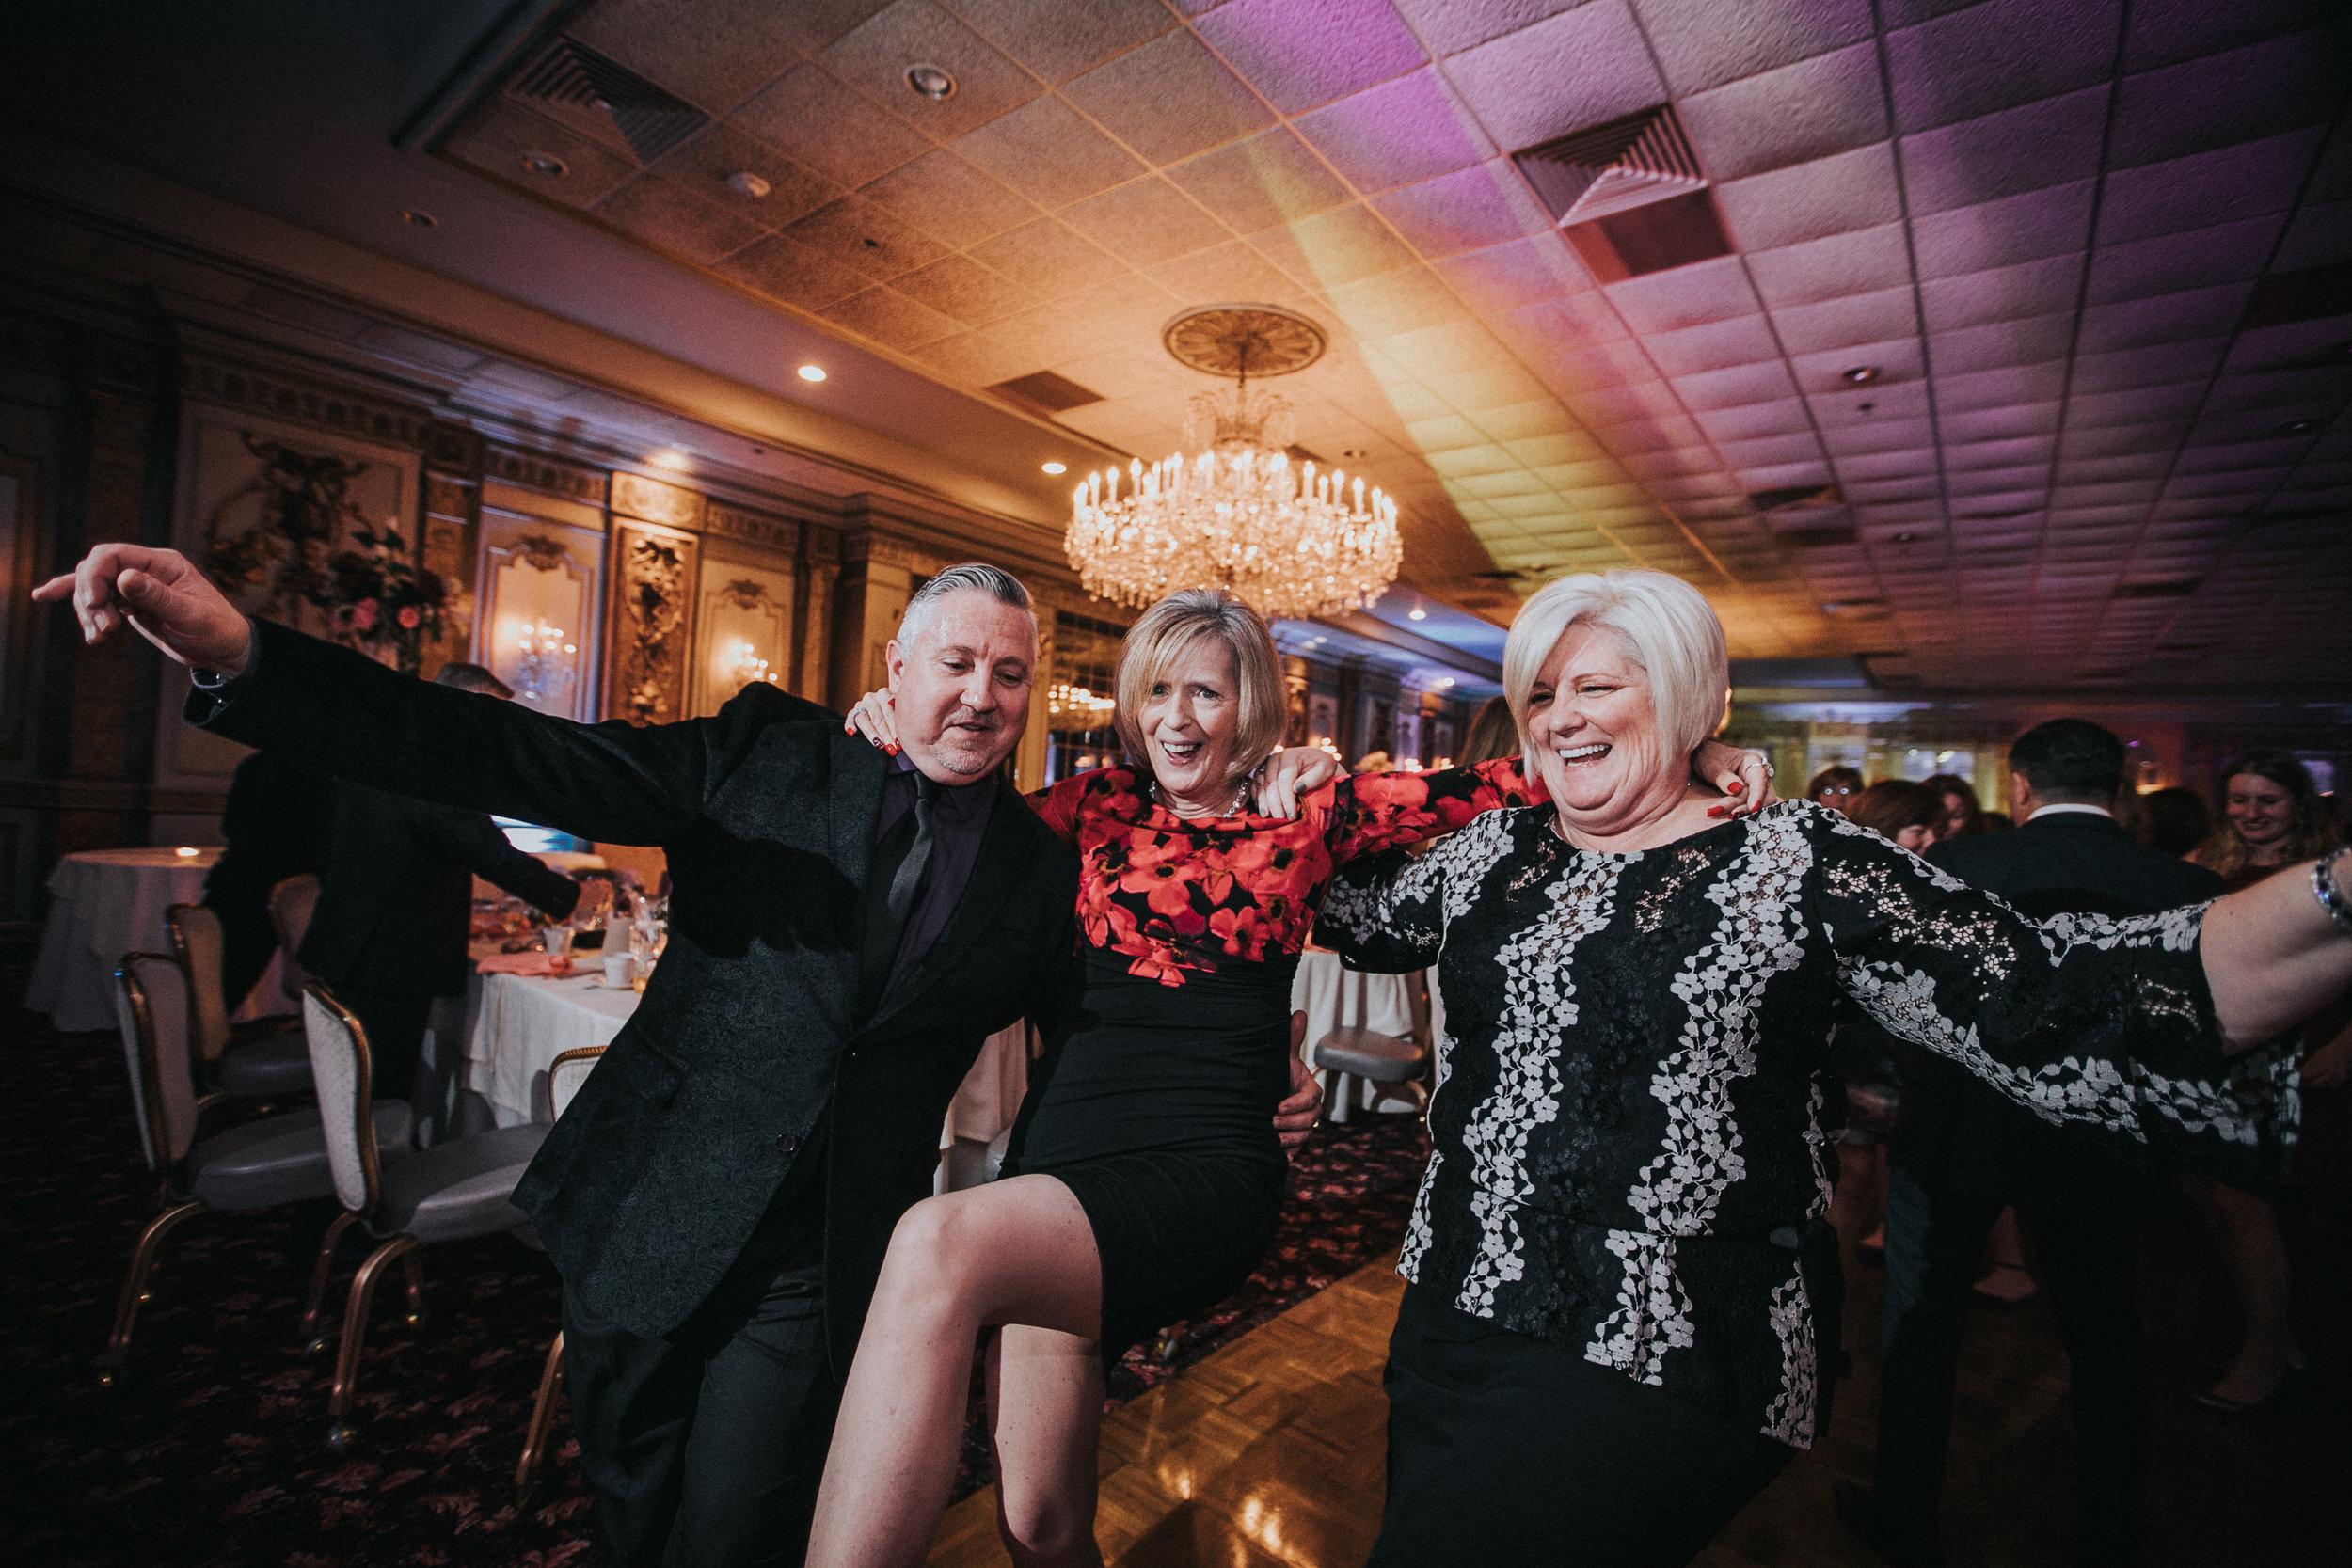 New-Jersey-Wedding-Photography-Fishers-Tudor-House-JennaLynnPhotography-Reception-Kathleen&Eddie-232.jpg